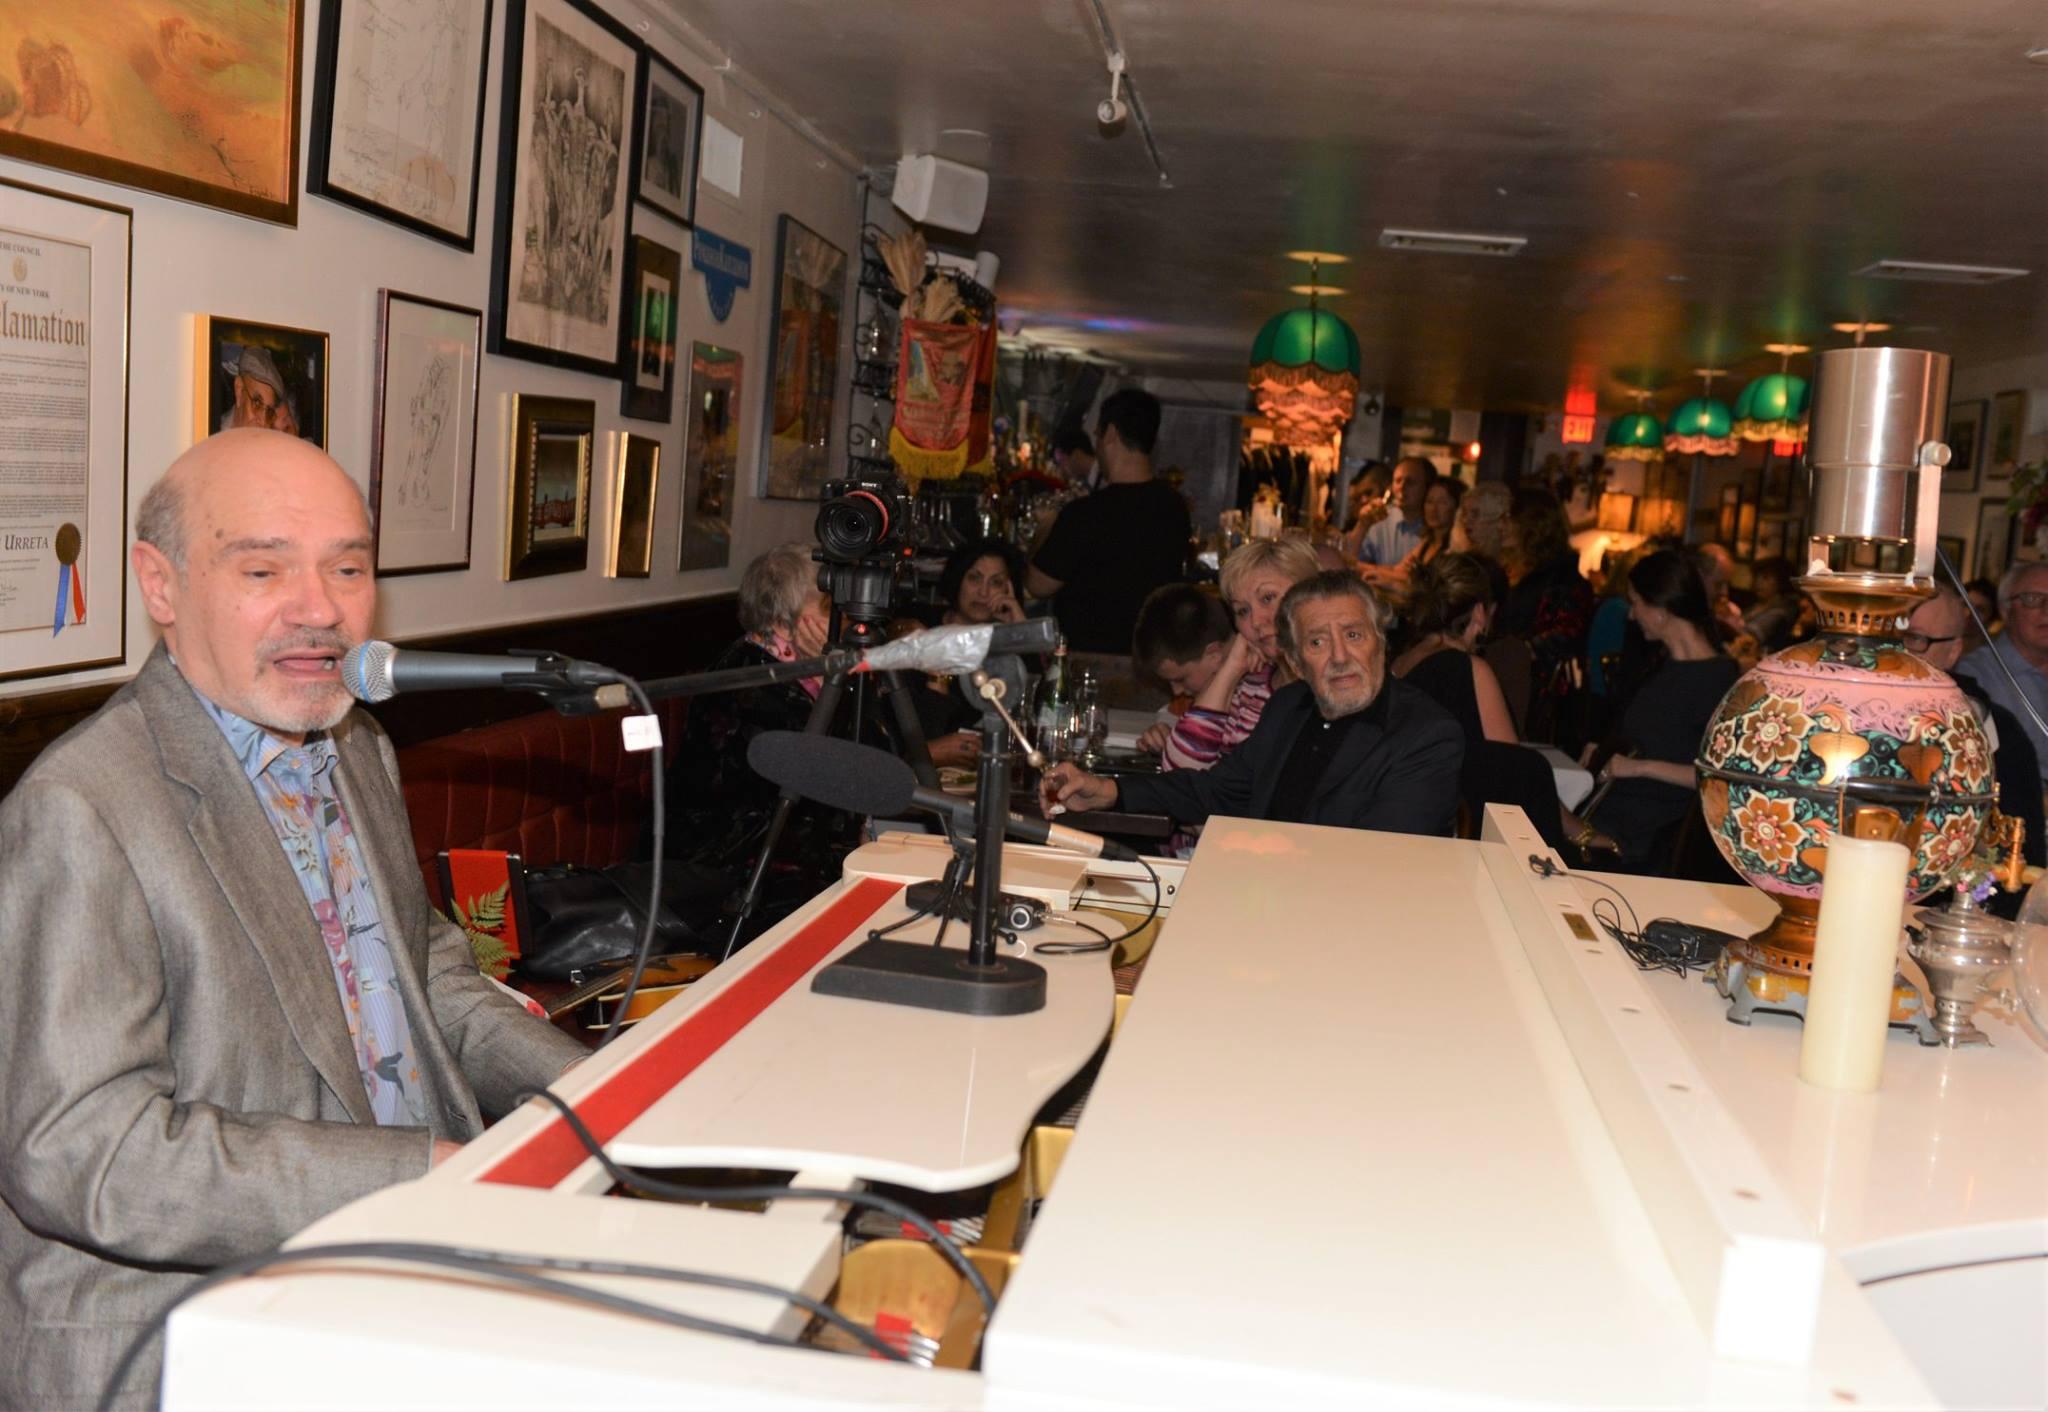 На вечере — 25 лет в САМОВАРЕ. Александр Избицер, за столиком — Роман Каплан. Фото Захара Левентула